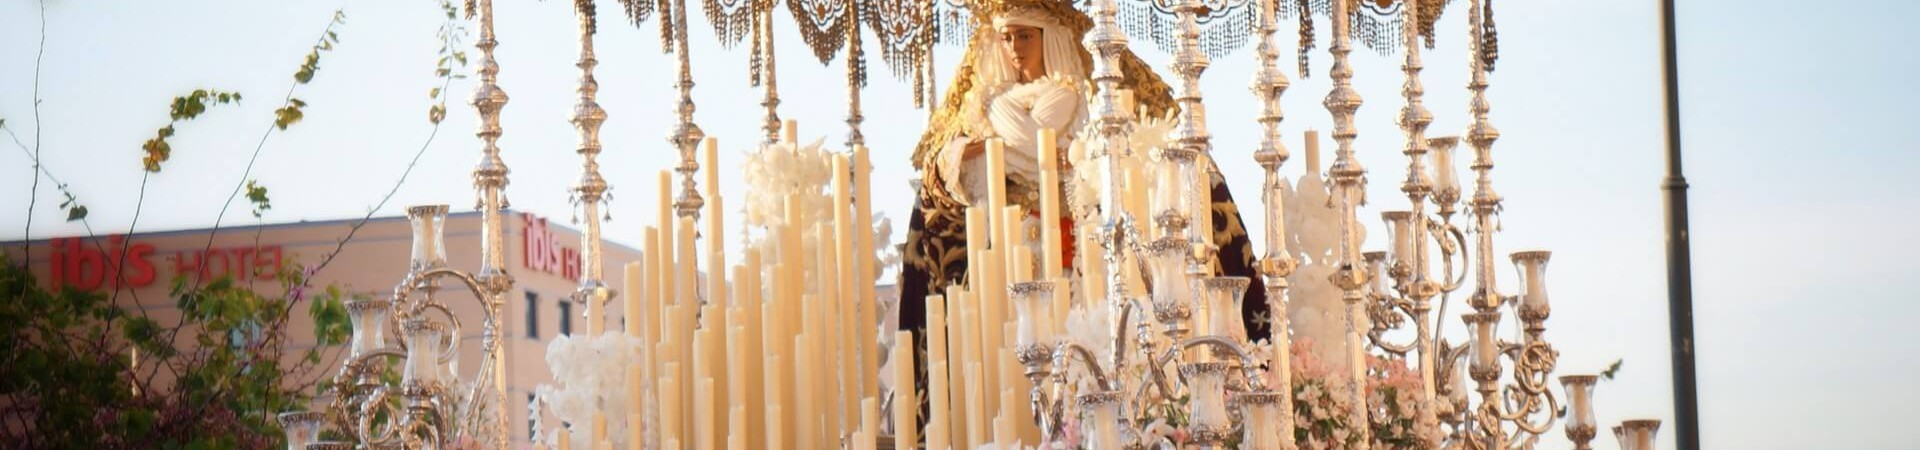 semana santa_Hiszpania_Malaga